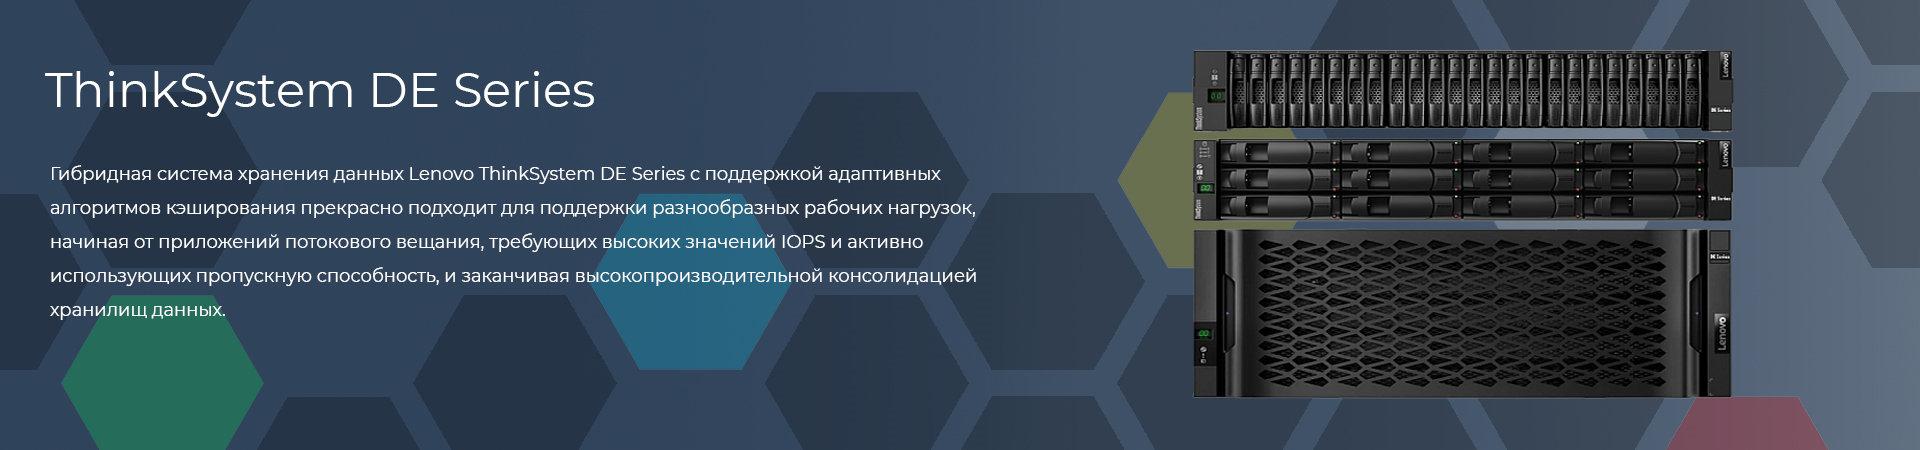 Lenovo-ThinkSystem-серии-DE